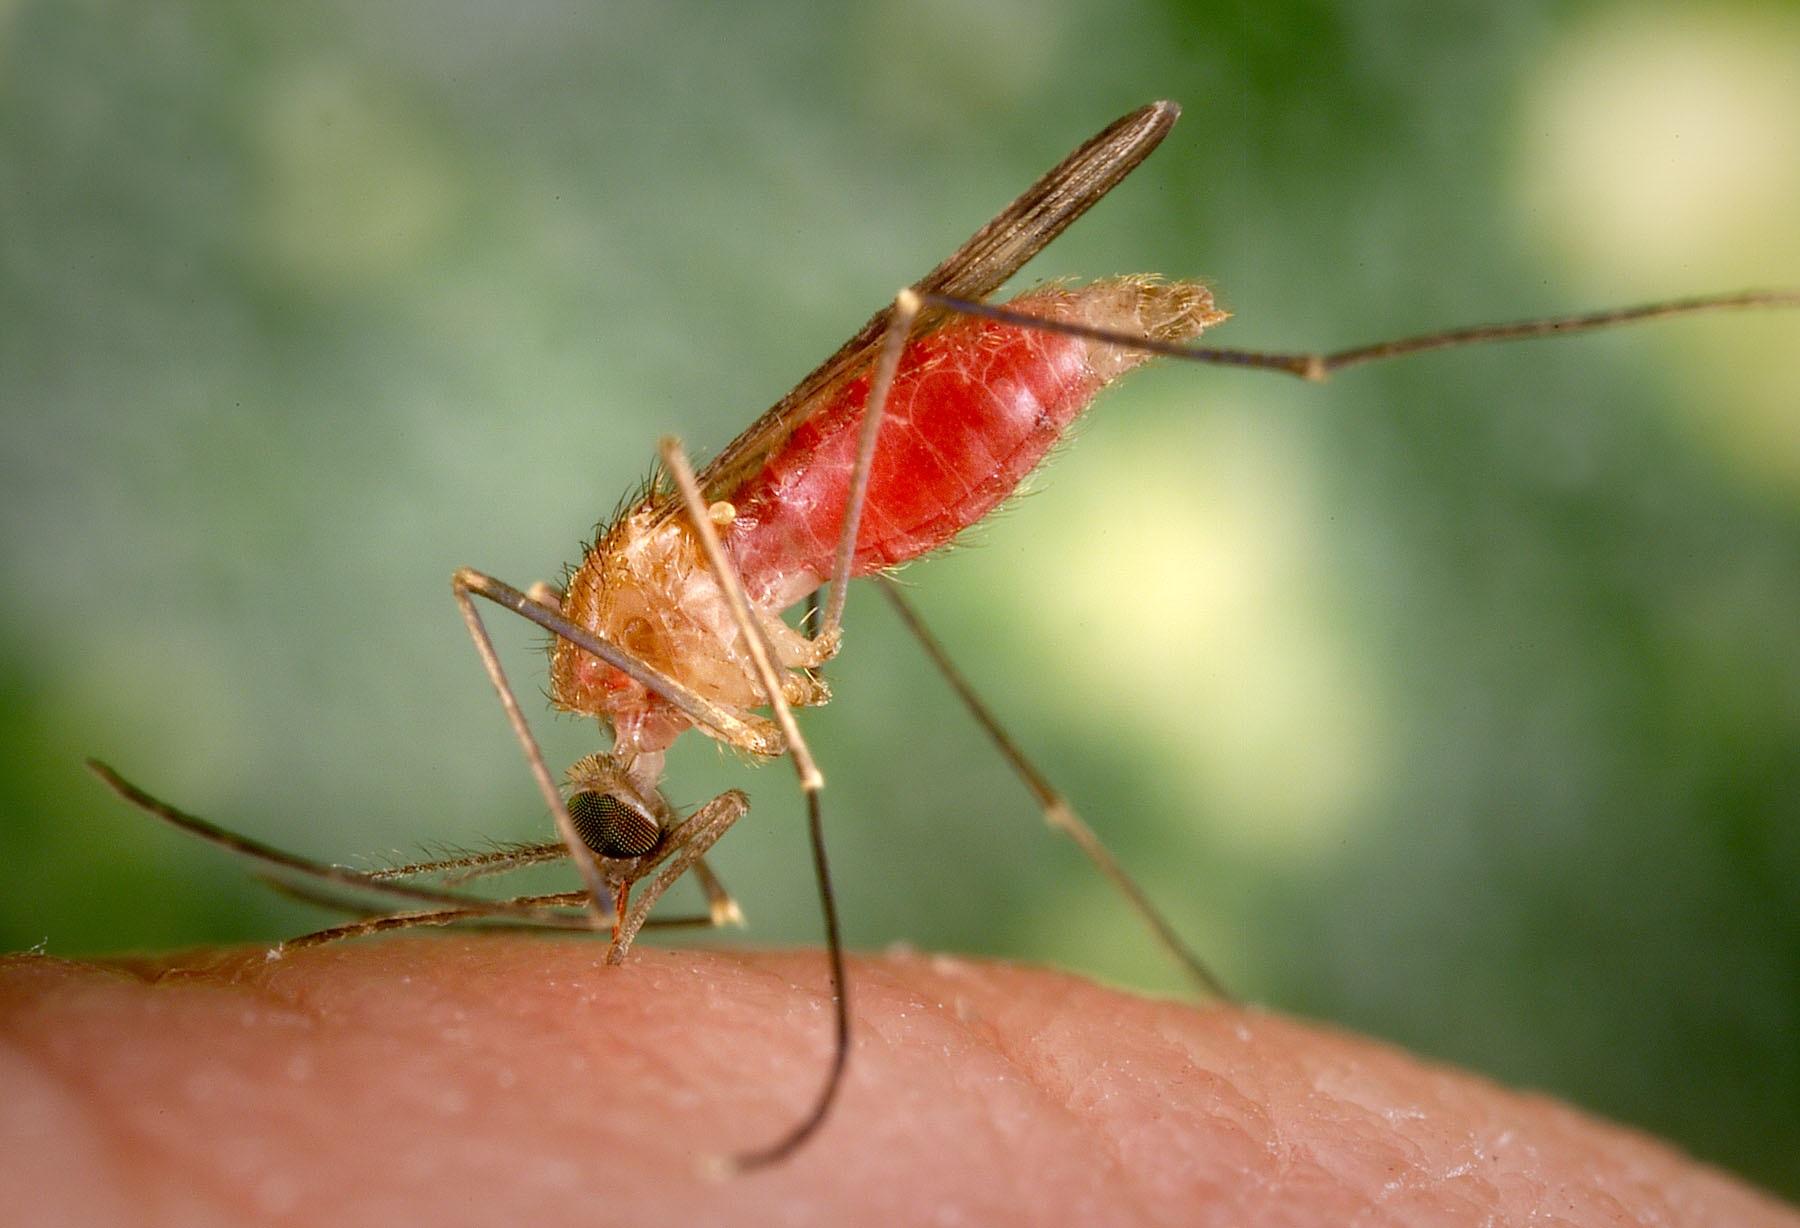 Image of Anopheles gambiae mosquito.